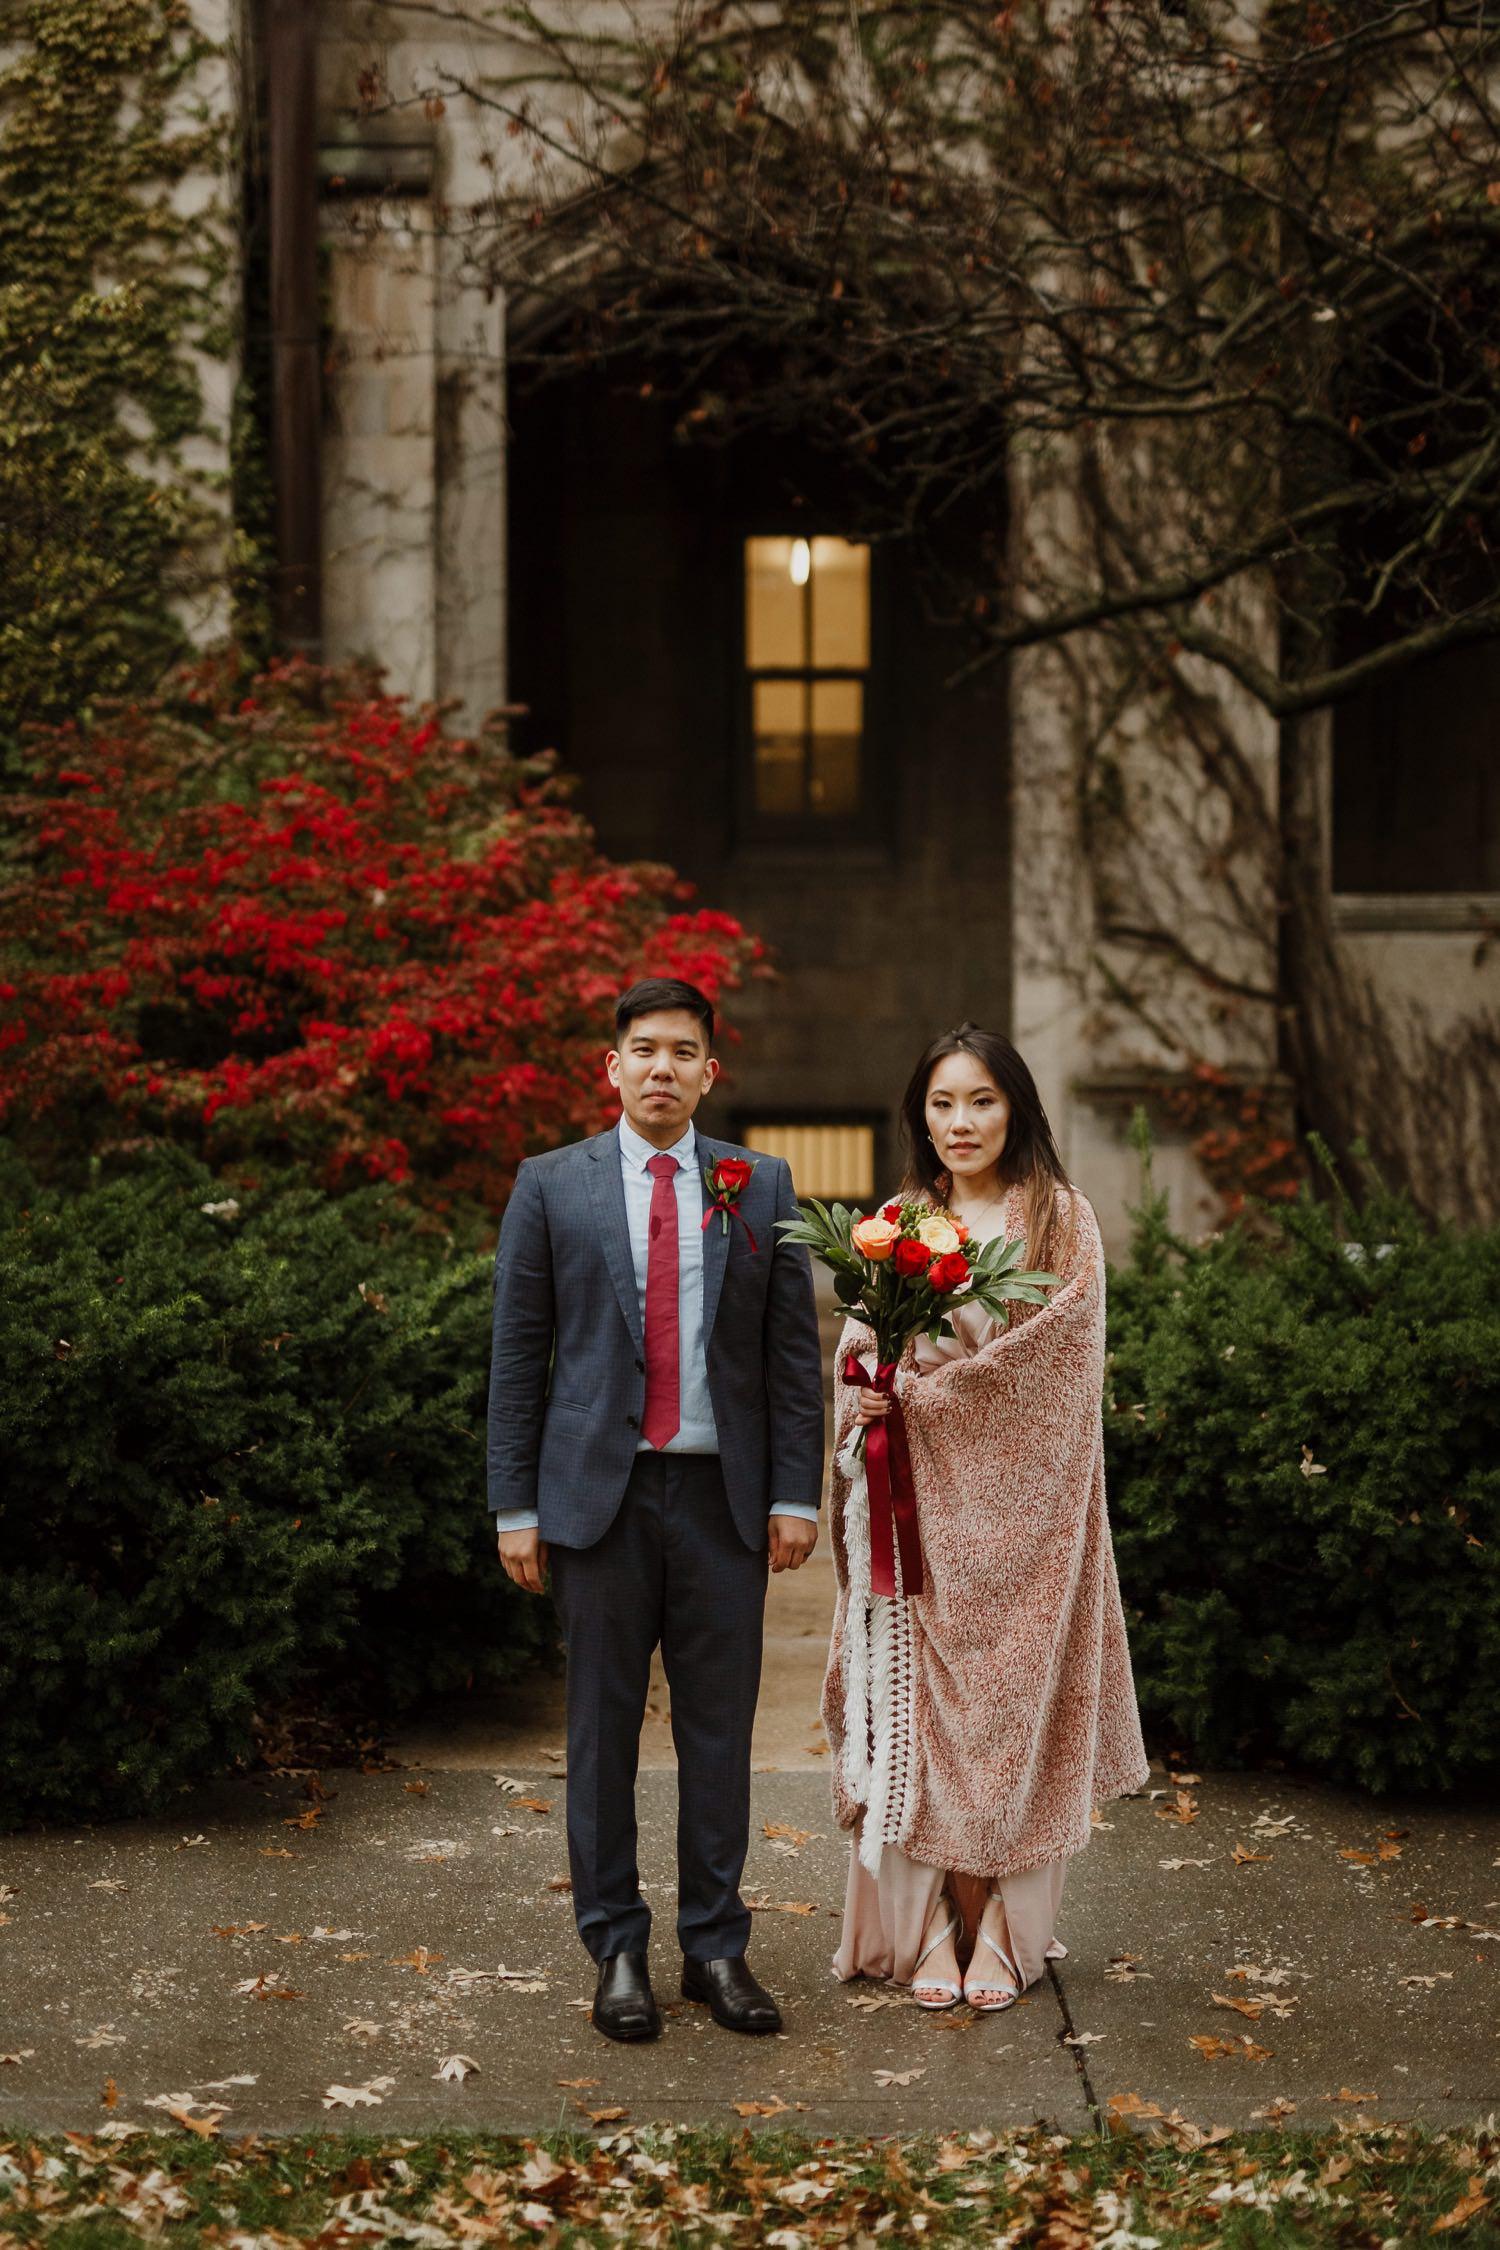 University of Chicago elopement photographer